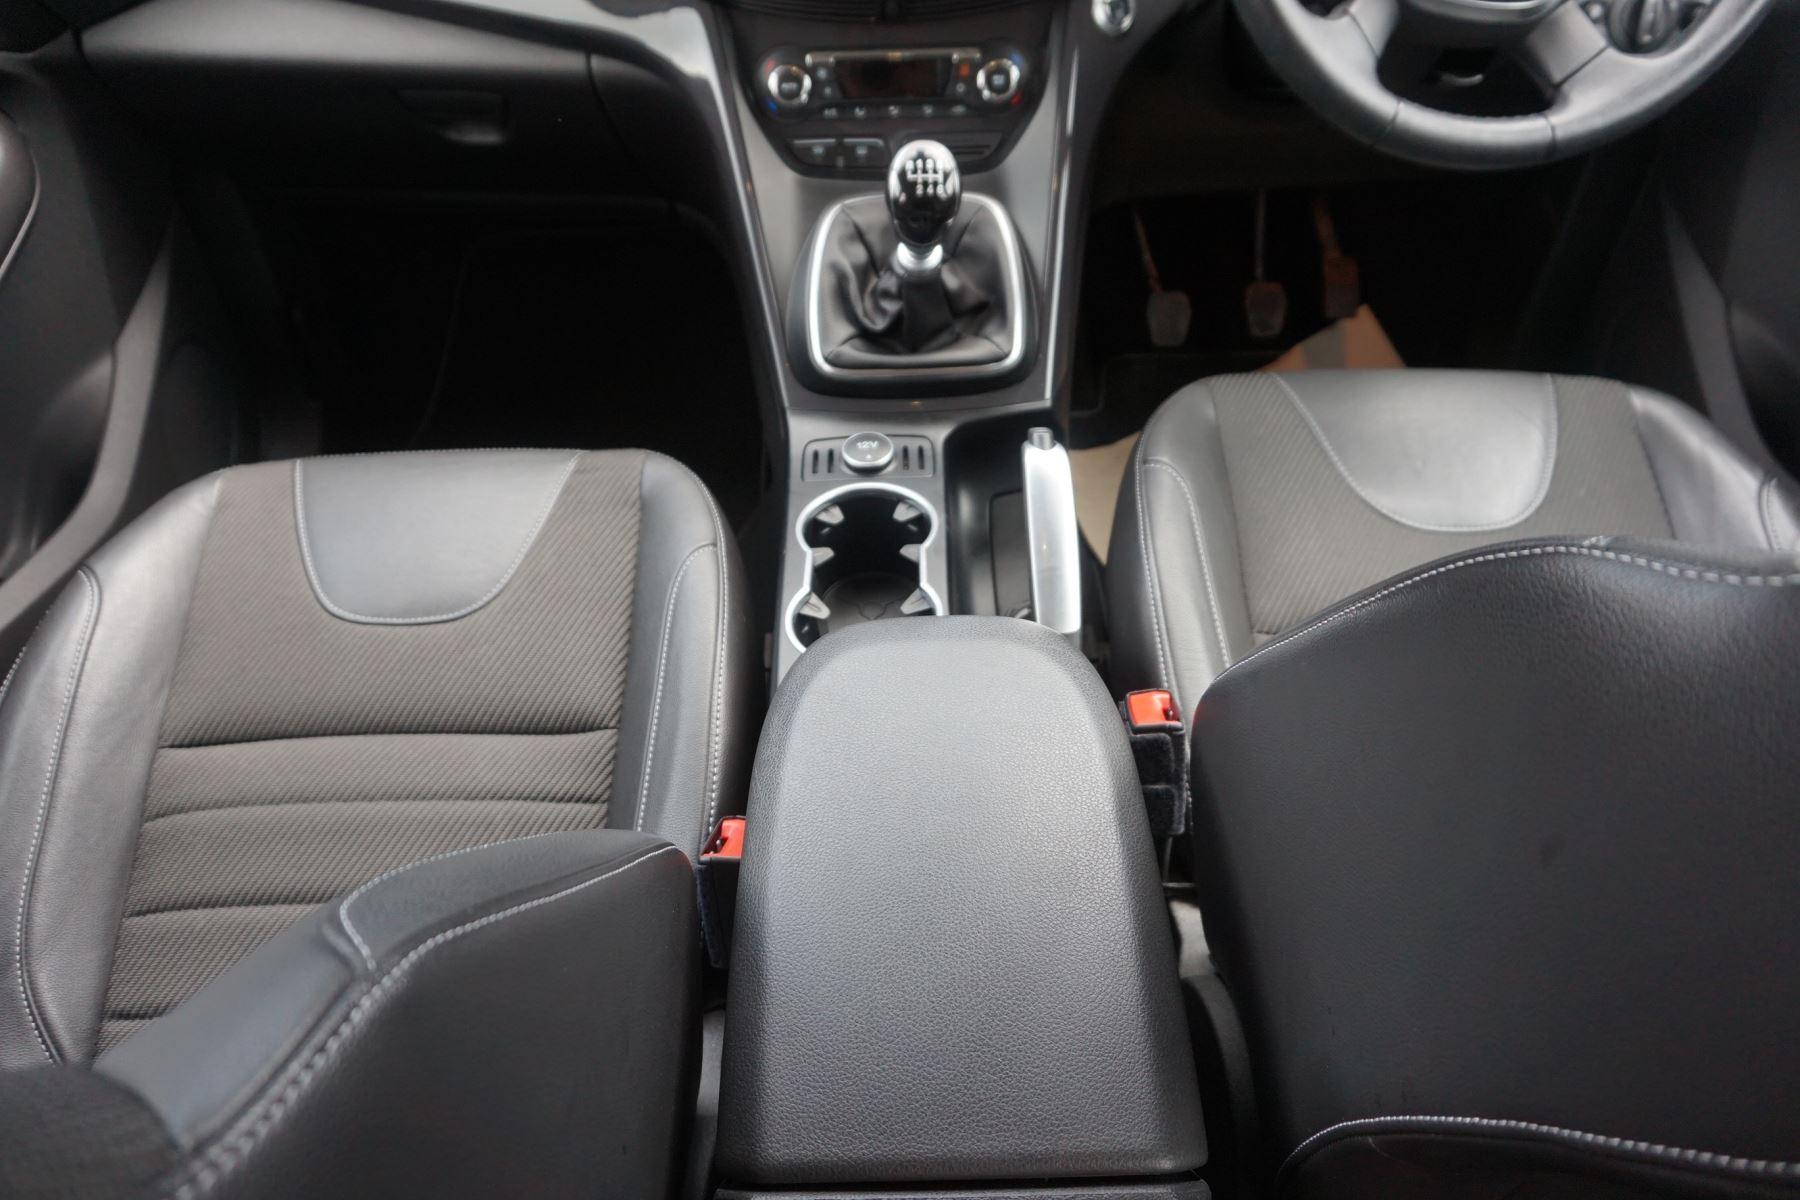 Ford Kuga 2.0 TDCi Titanium 2WD image 13